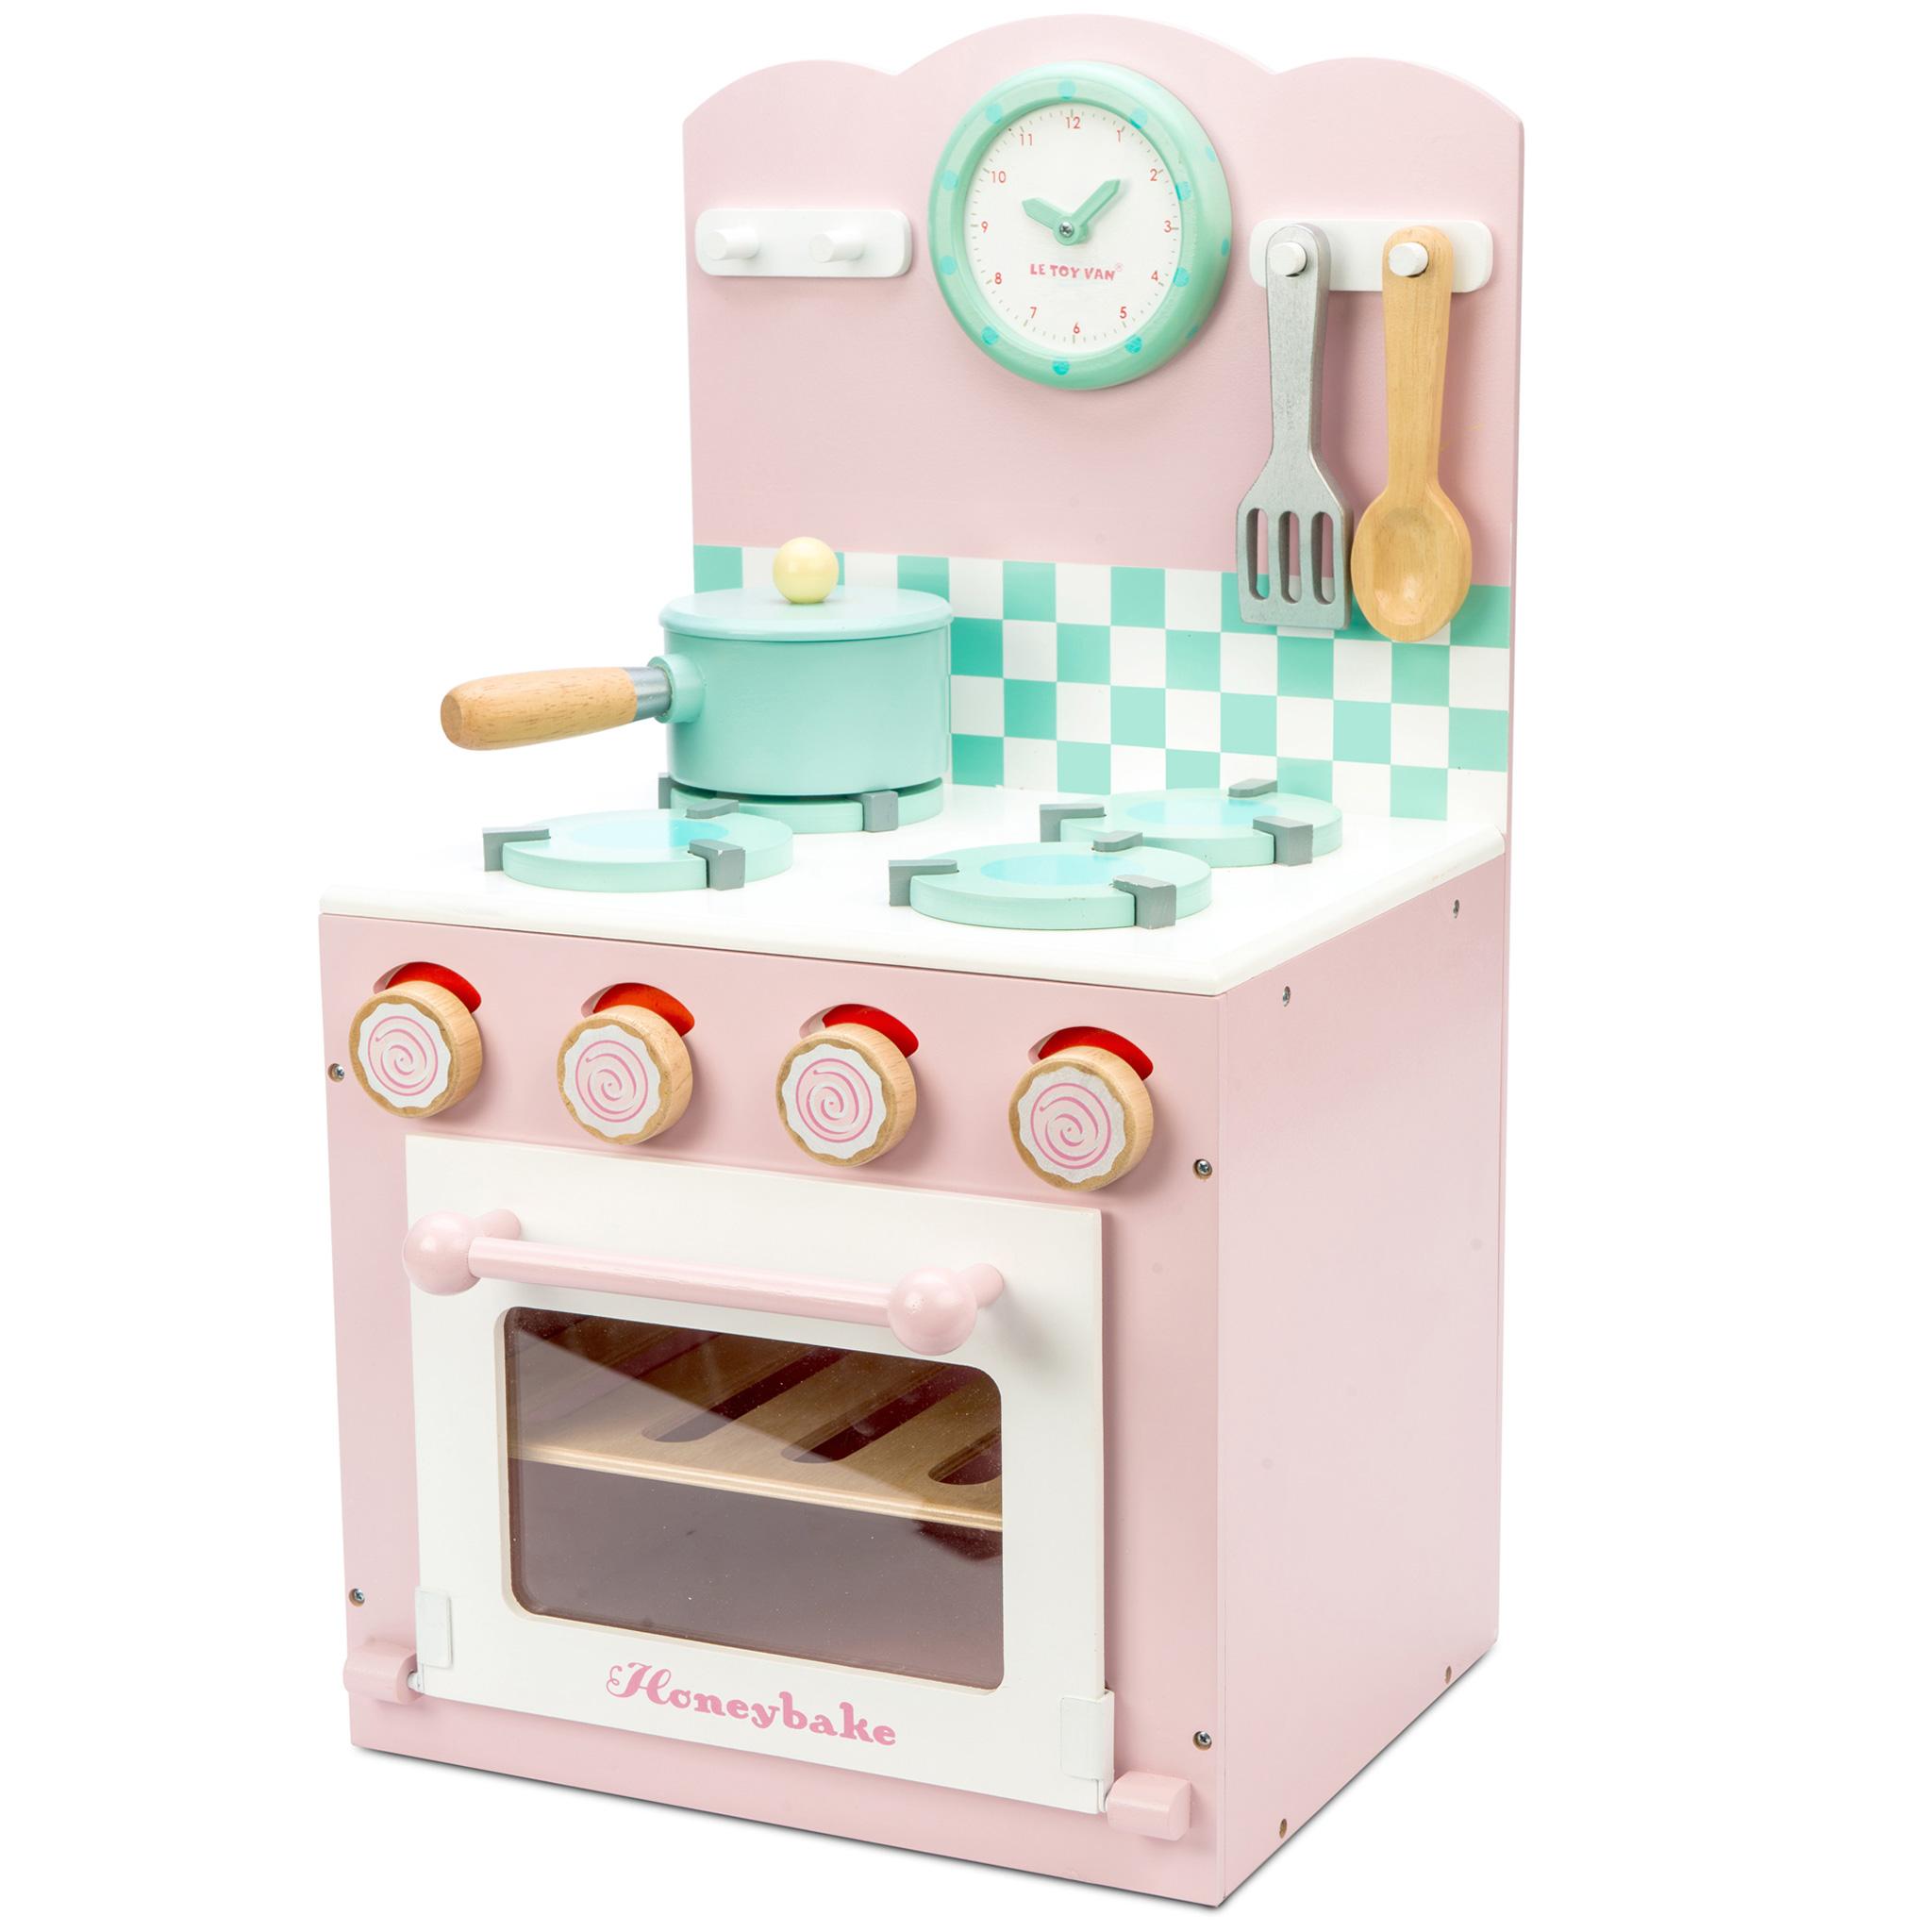 Oven & Hob Pink